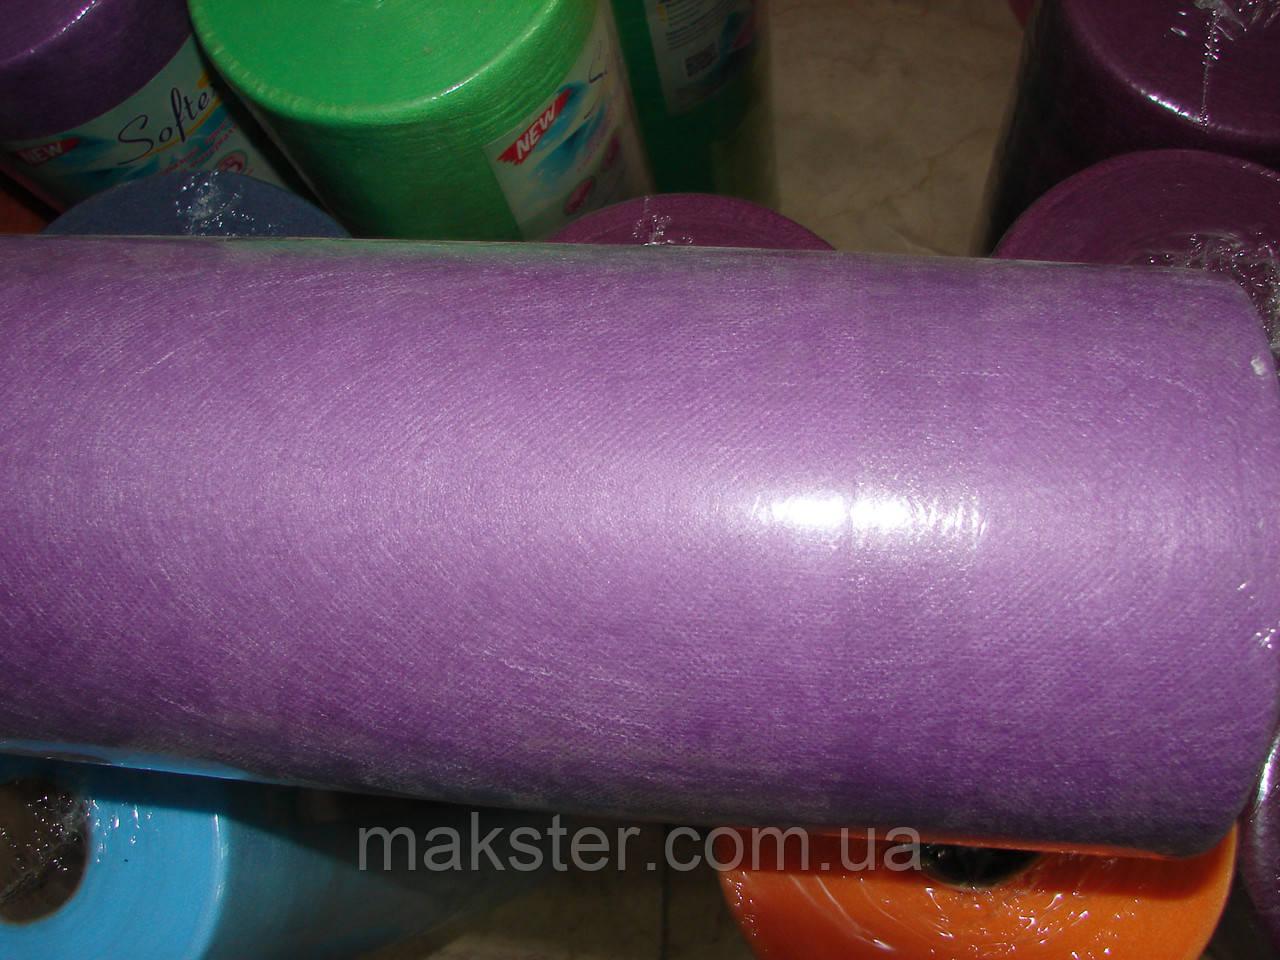 Простынь одноразовая, лиловая, 20гр/м 0,8 х 100м